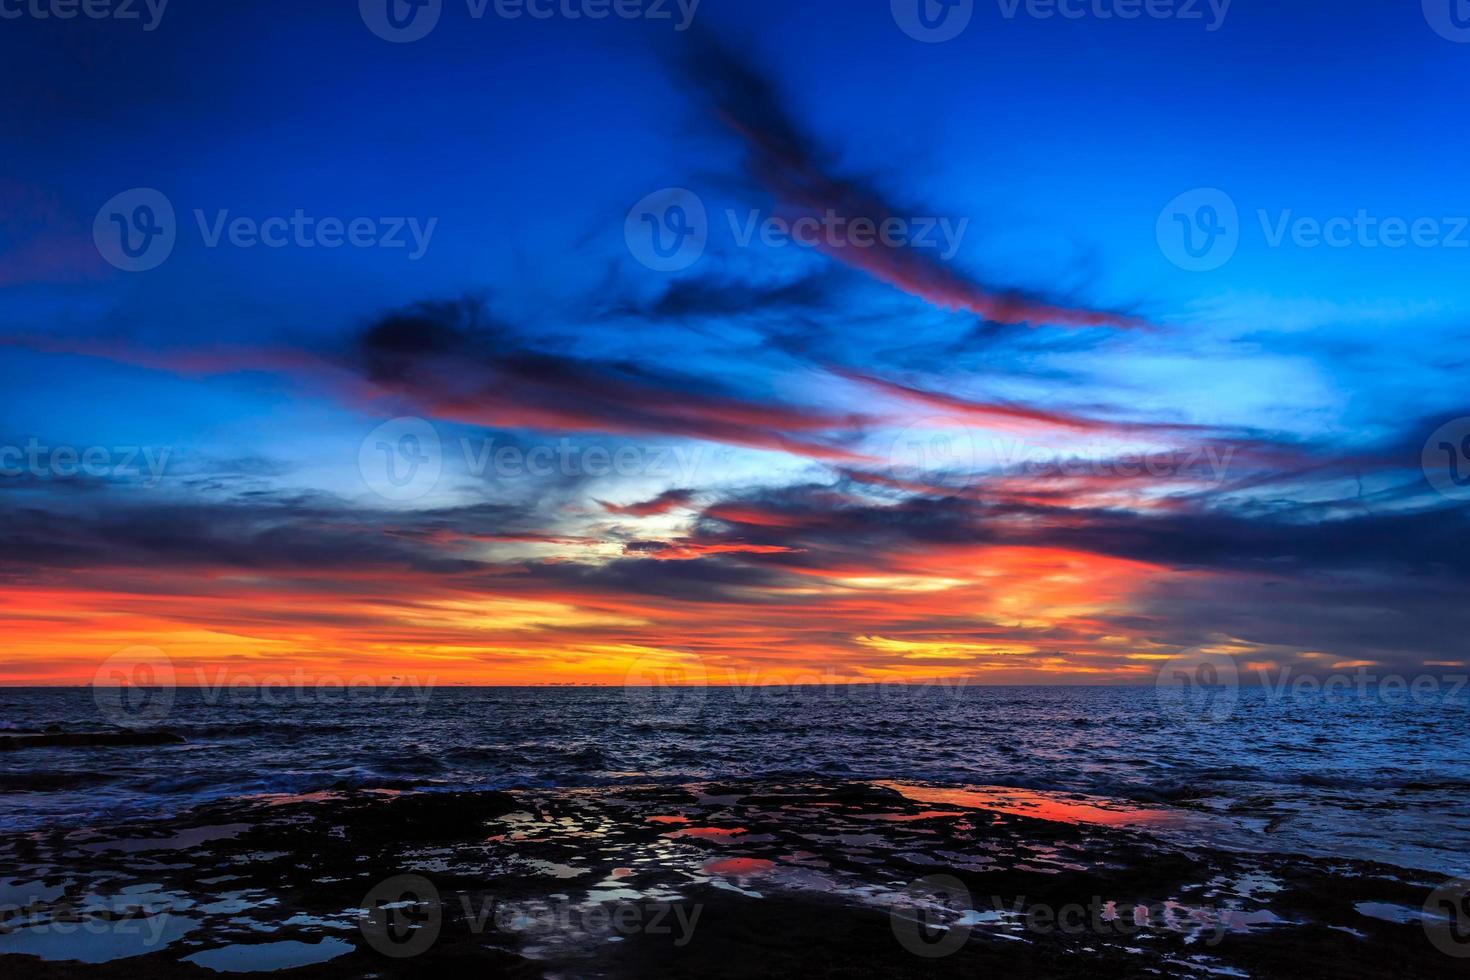 dramatische zonsondergang in Bali foto